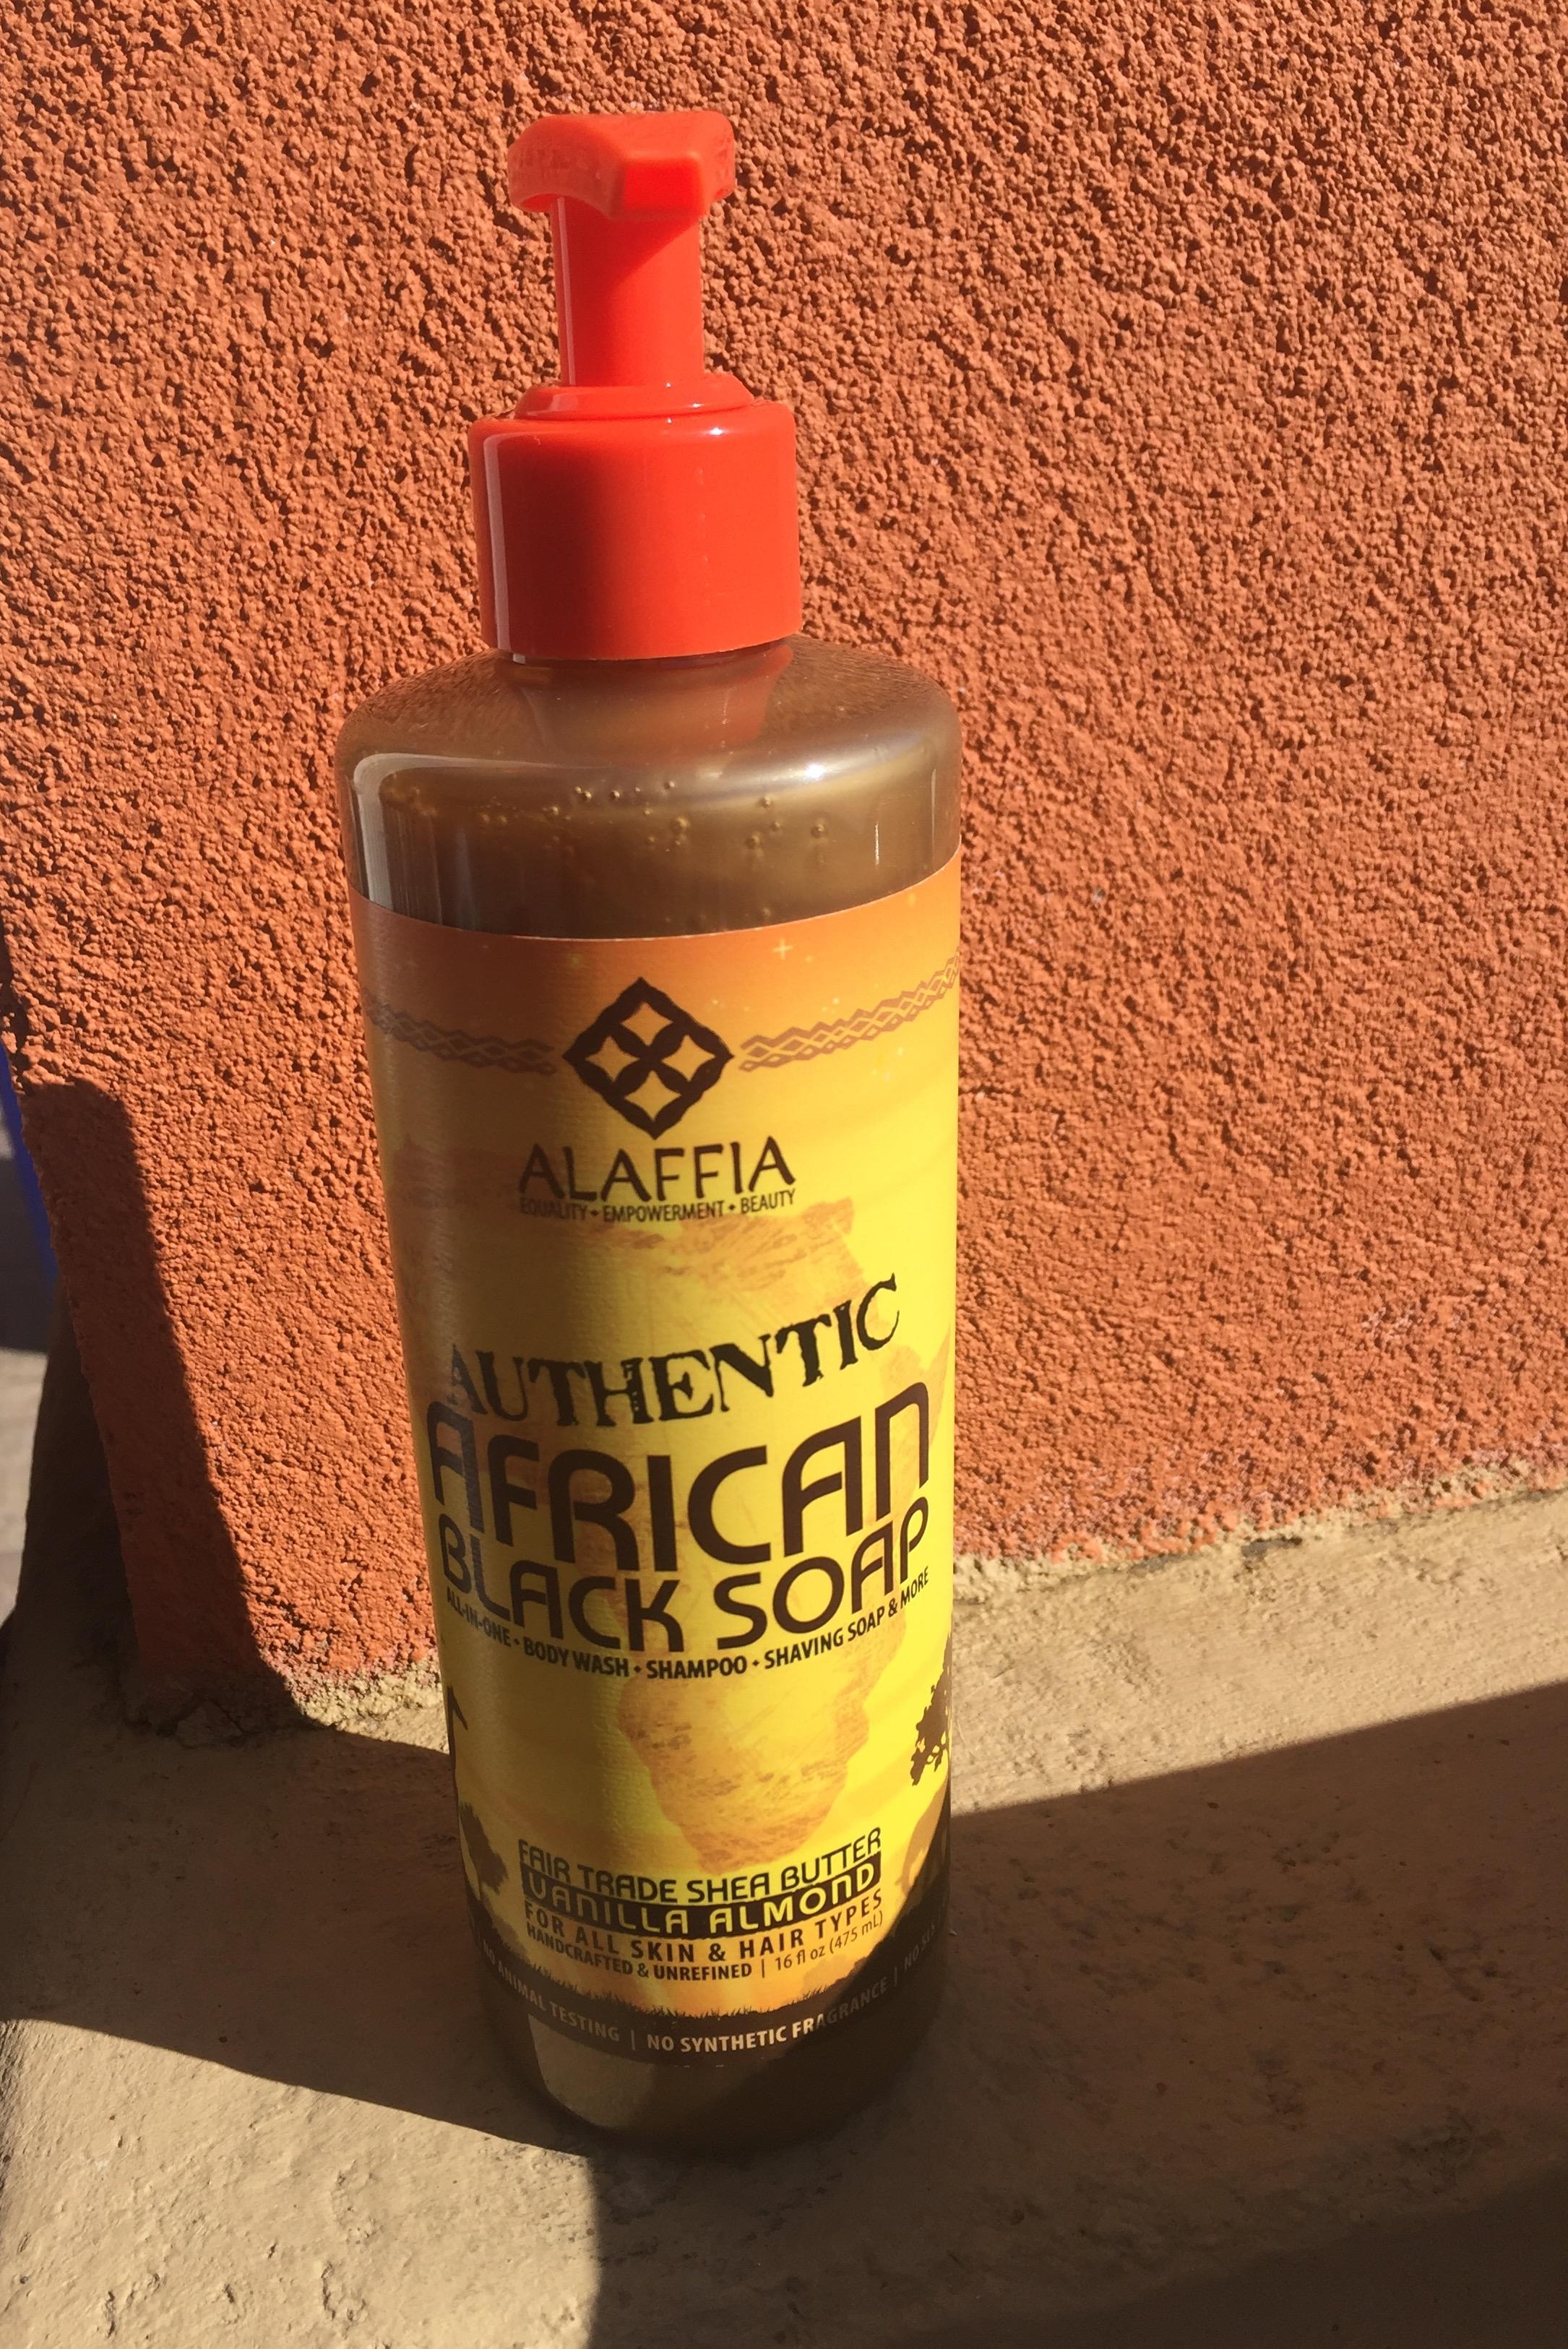 Alaffia Vanilla Almond African Black Soap 1